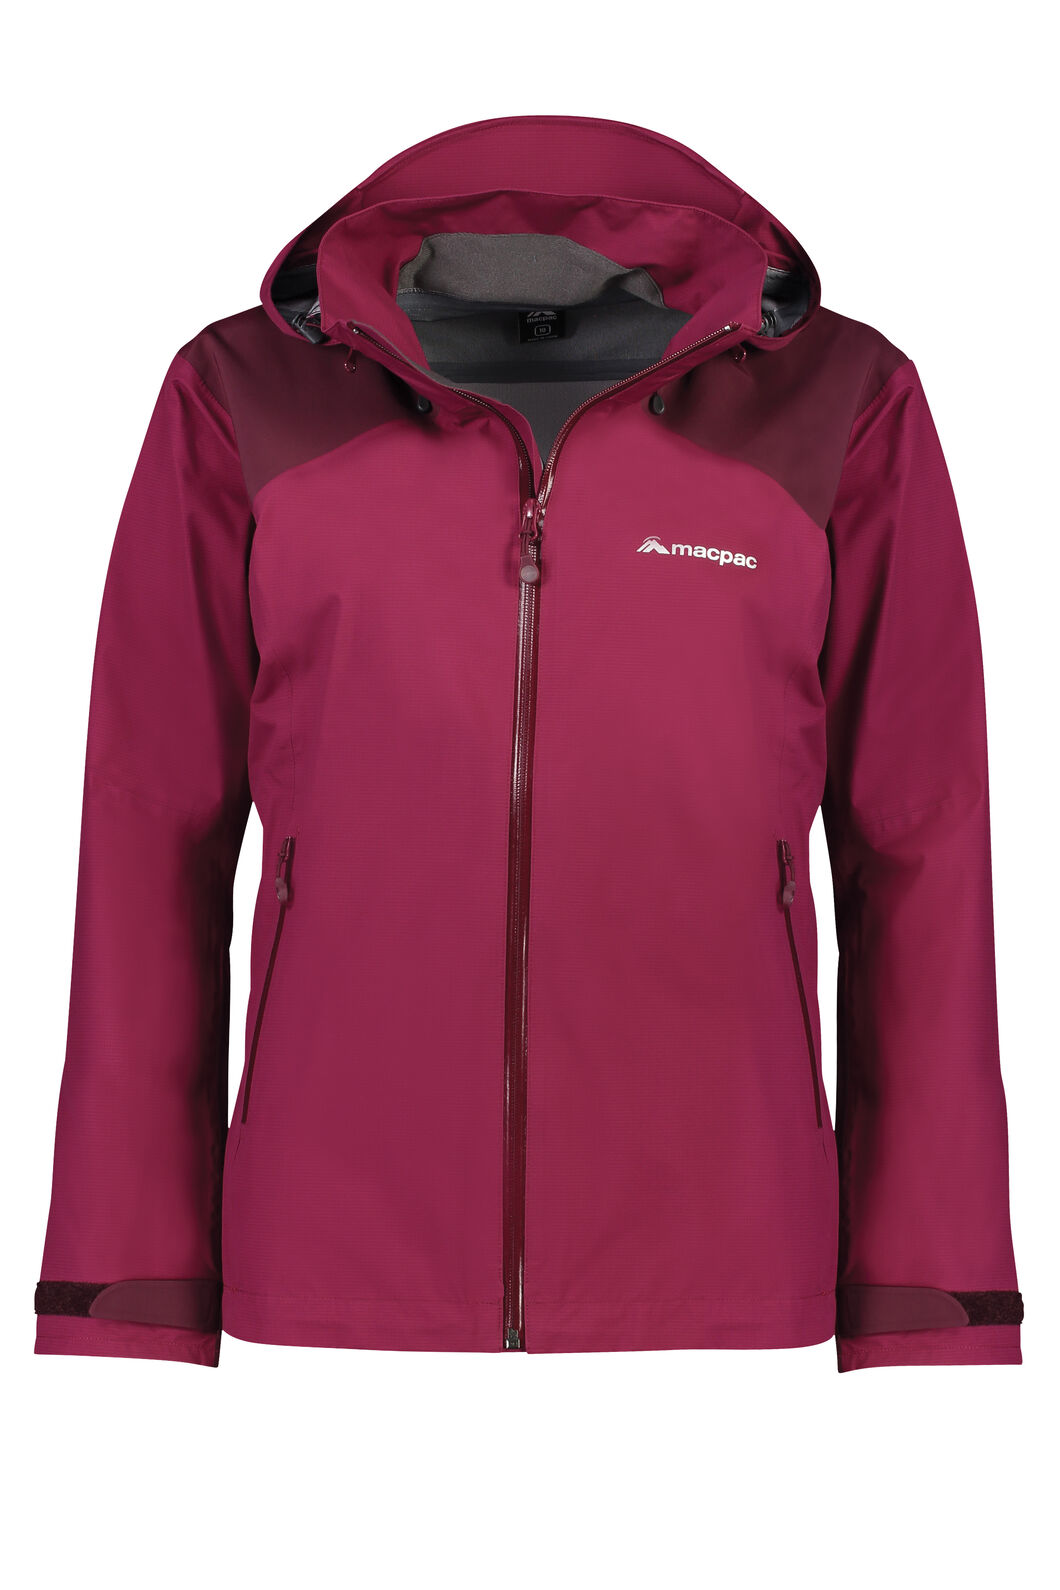 Traverse Pertex Shield® Rain Jacket - Women's, Beet Red, hi-res